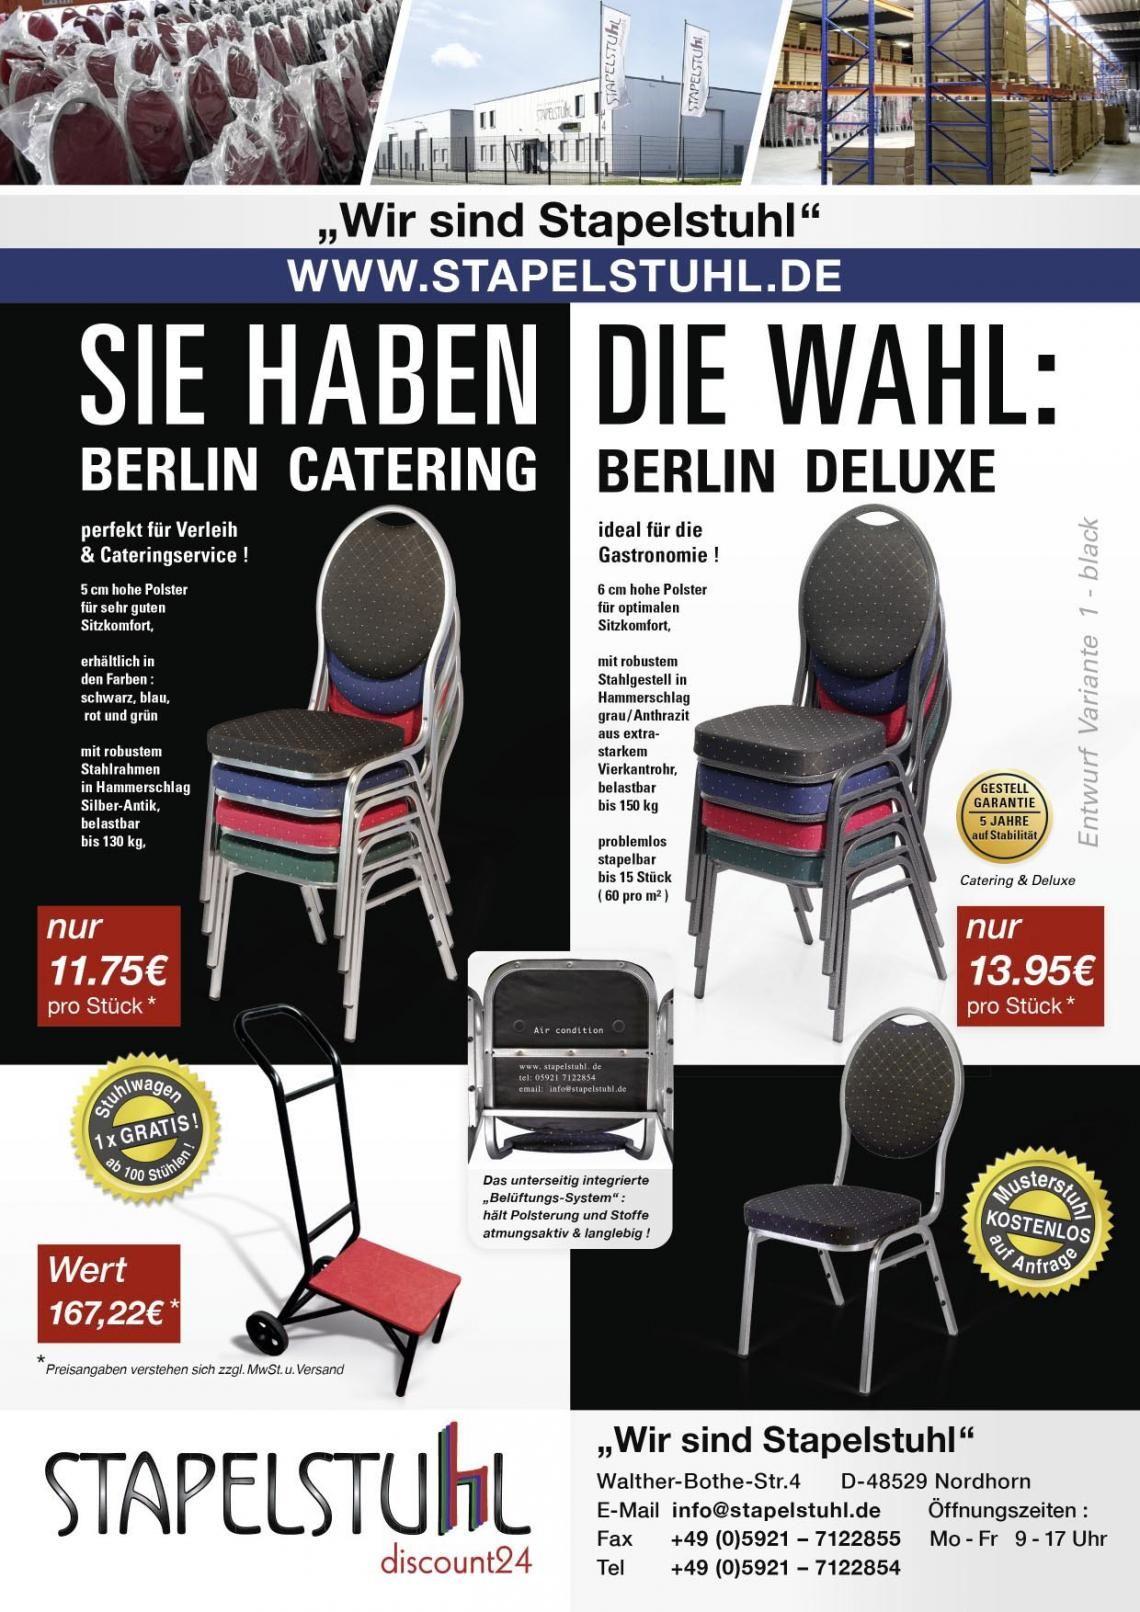 Stapelstuhl - Discount24 | Stapelstühle,